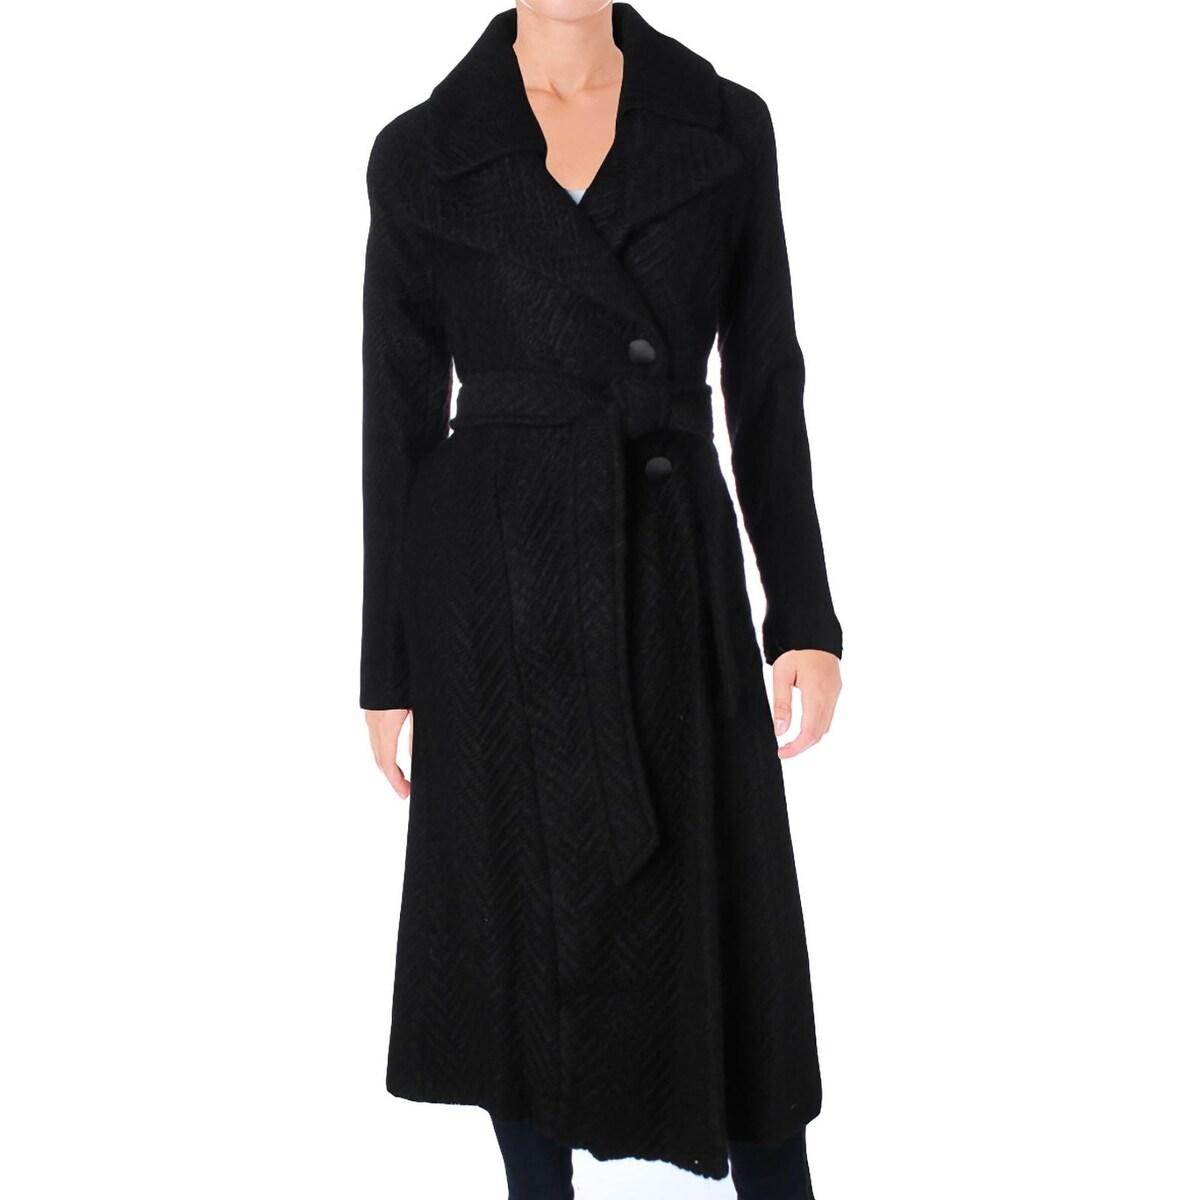 13be27fad649 Shop Nanette Lepore Womens Maxi Coat Winter Herringbone - Free Shipping  Today - Overstock - 18691930